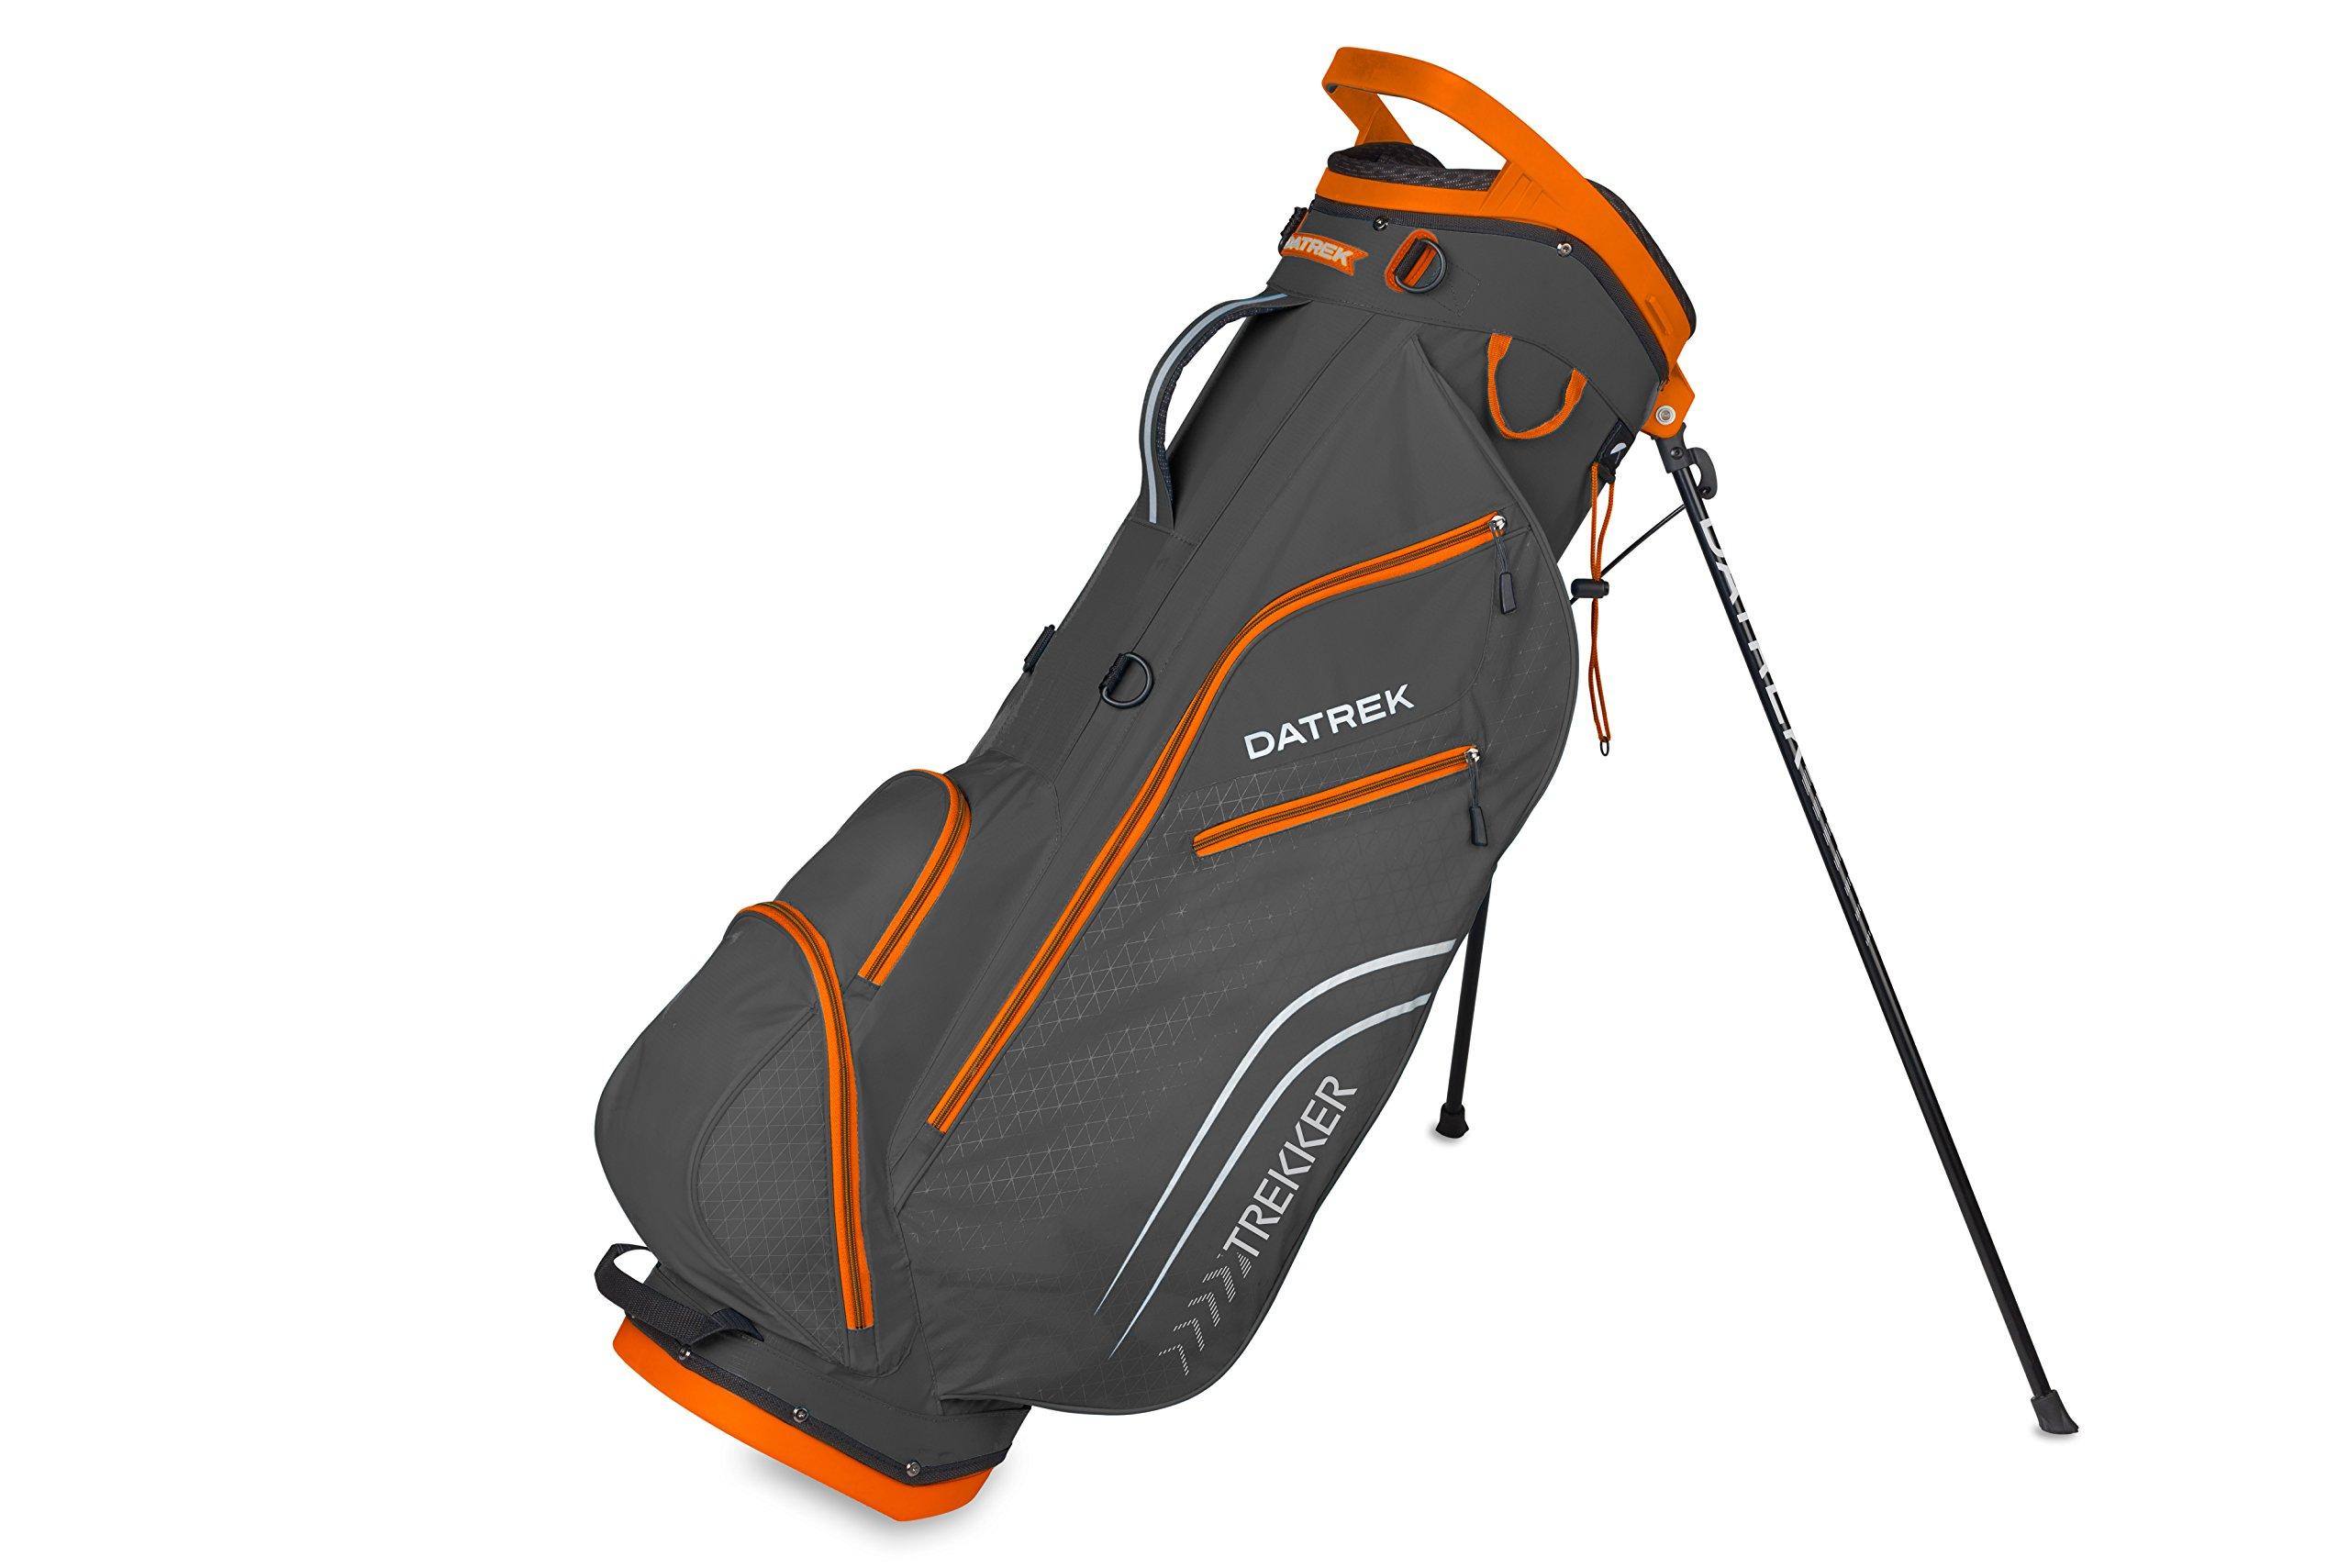 Datrek Golf Trekker Ultra Lite Stand Bag (Charcoal/Orange)